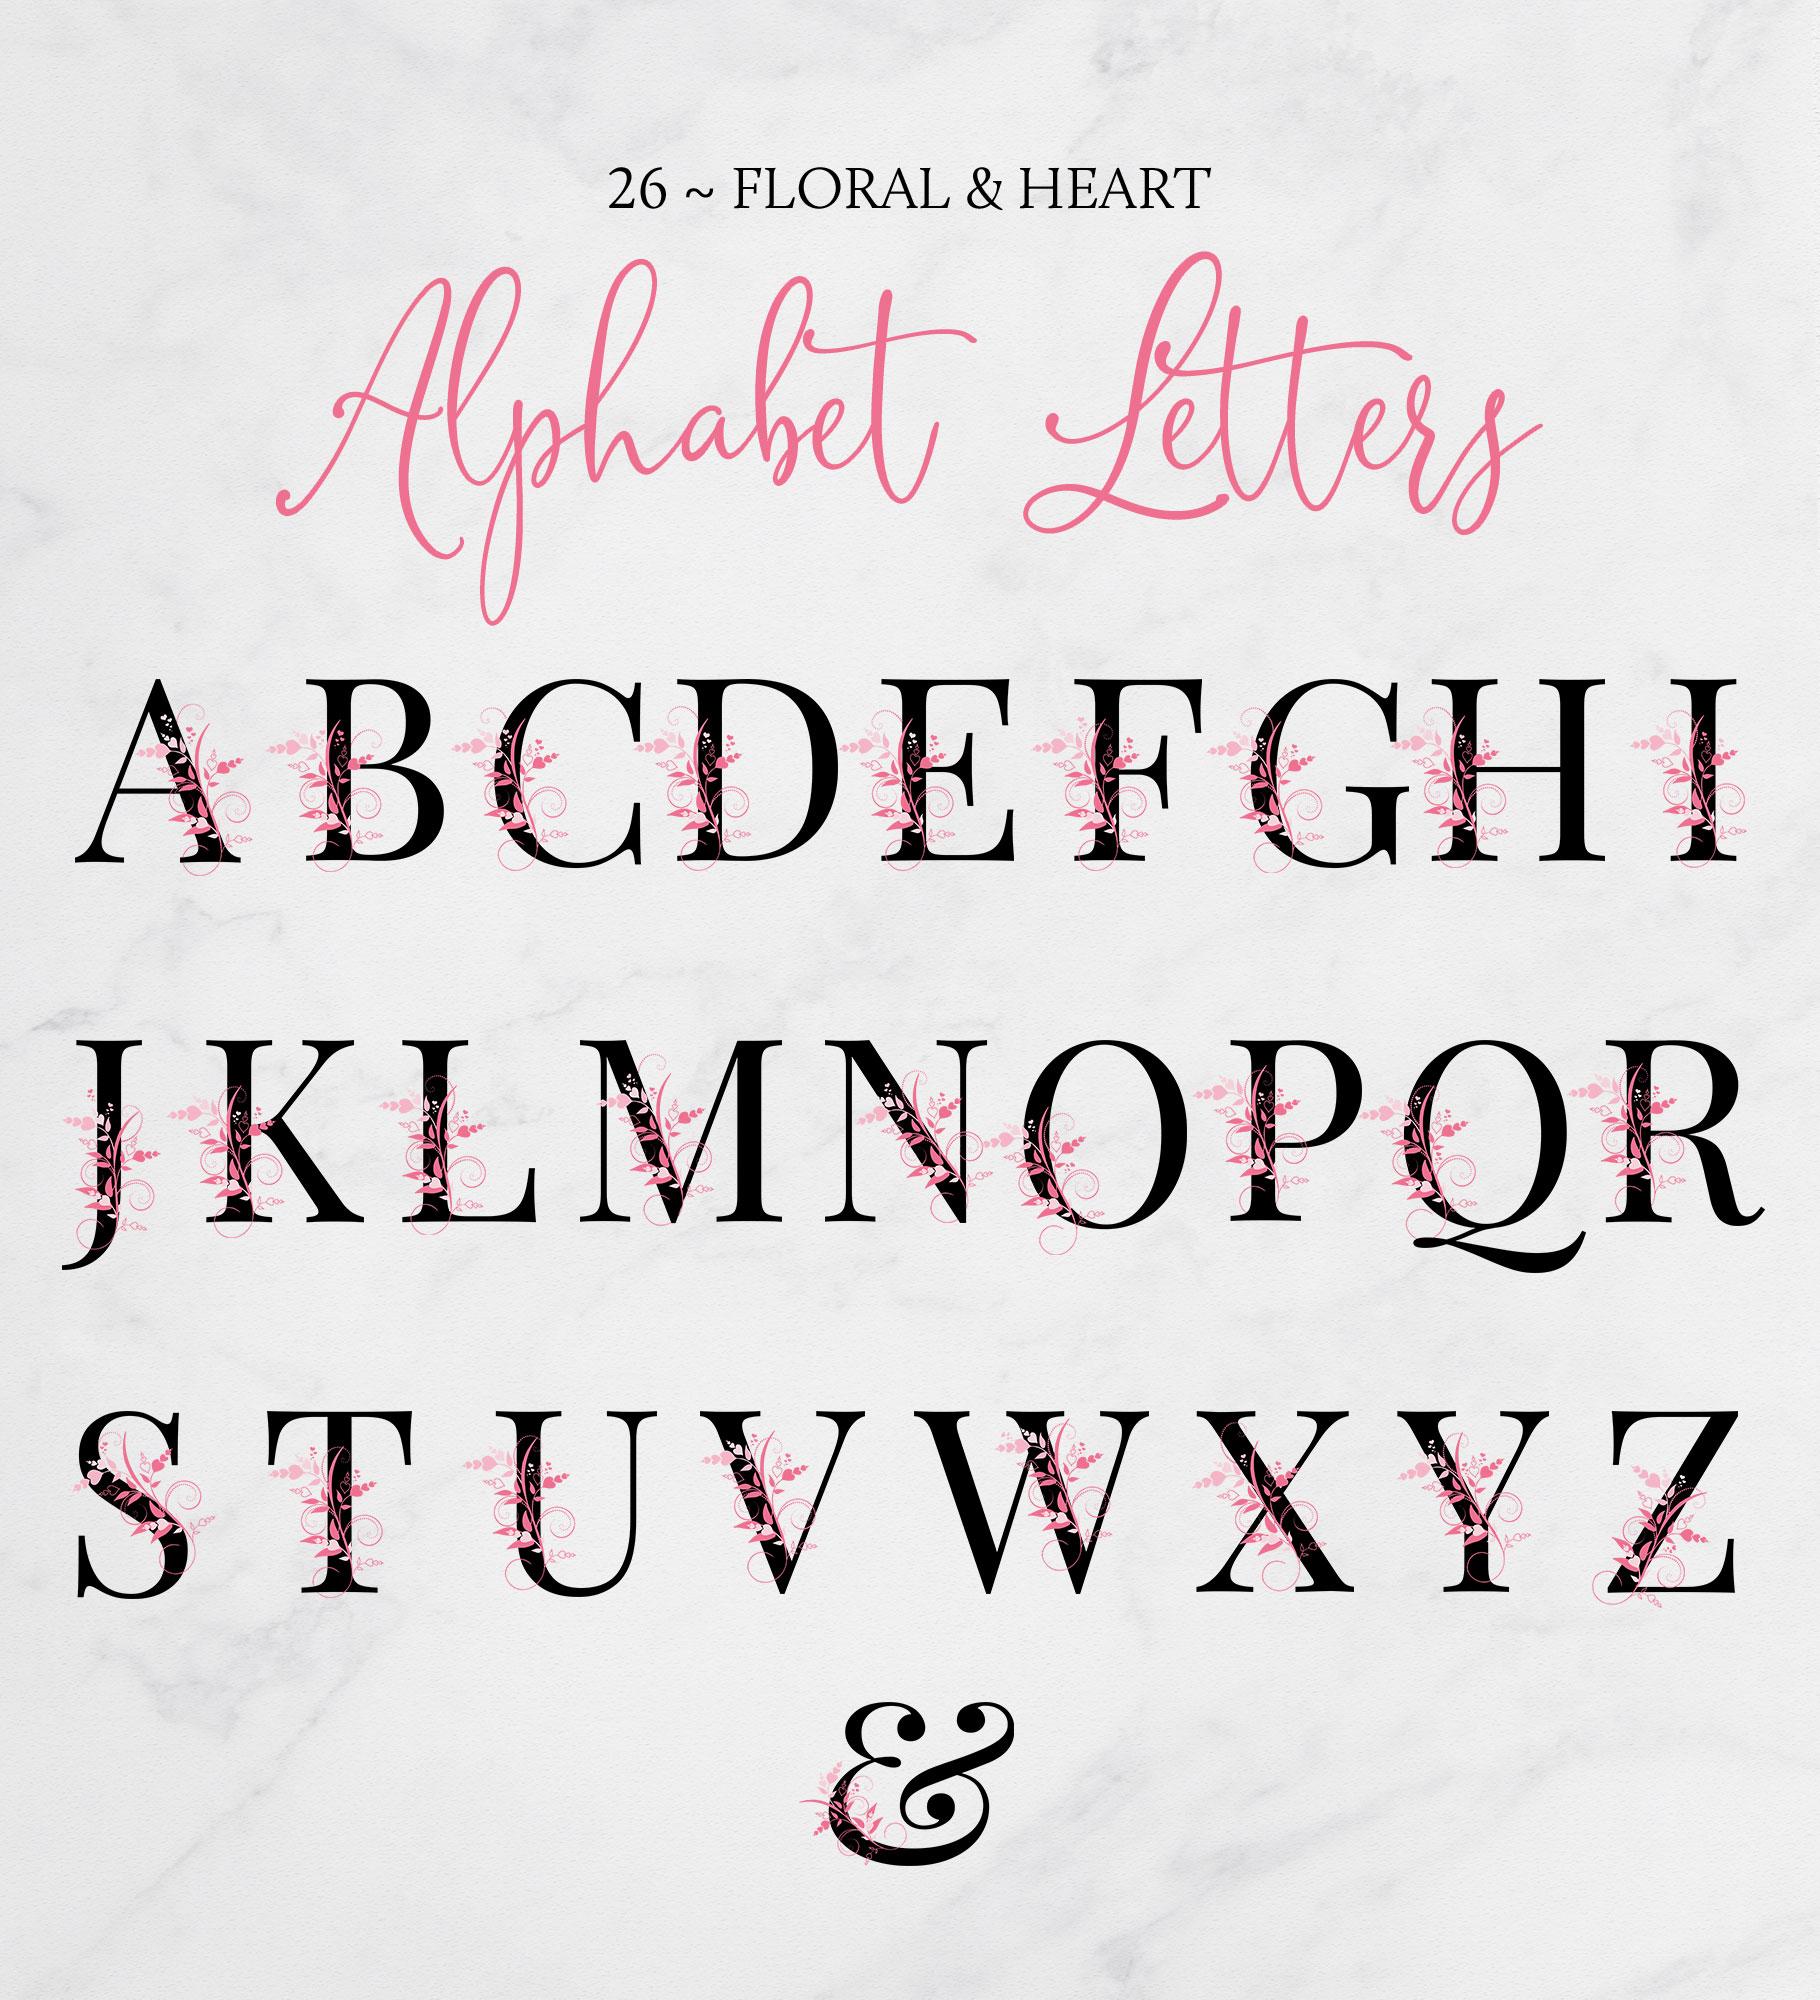 Floral & Heart Alphabet